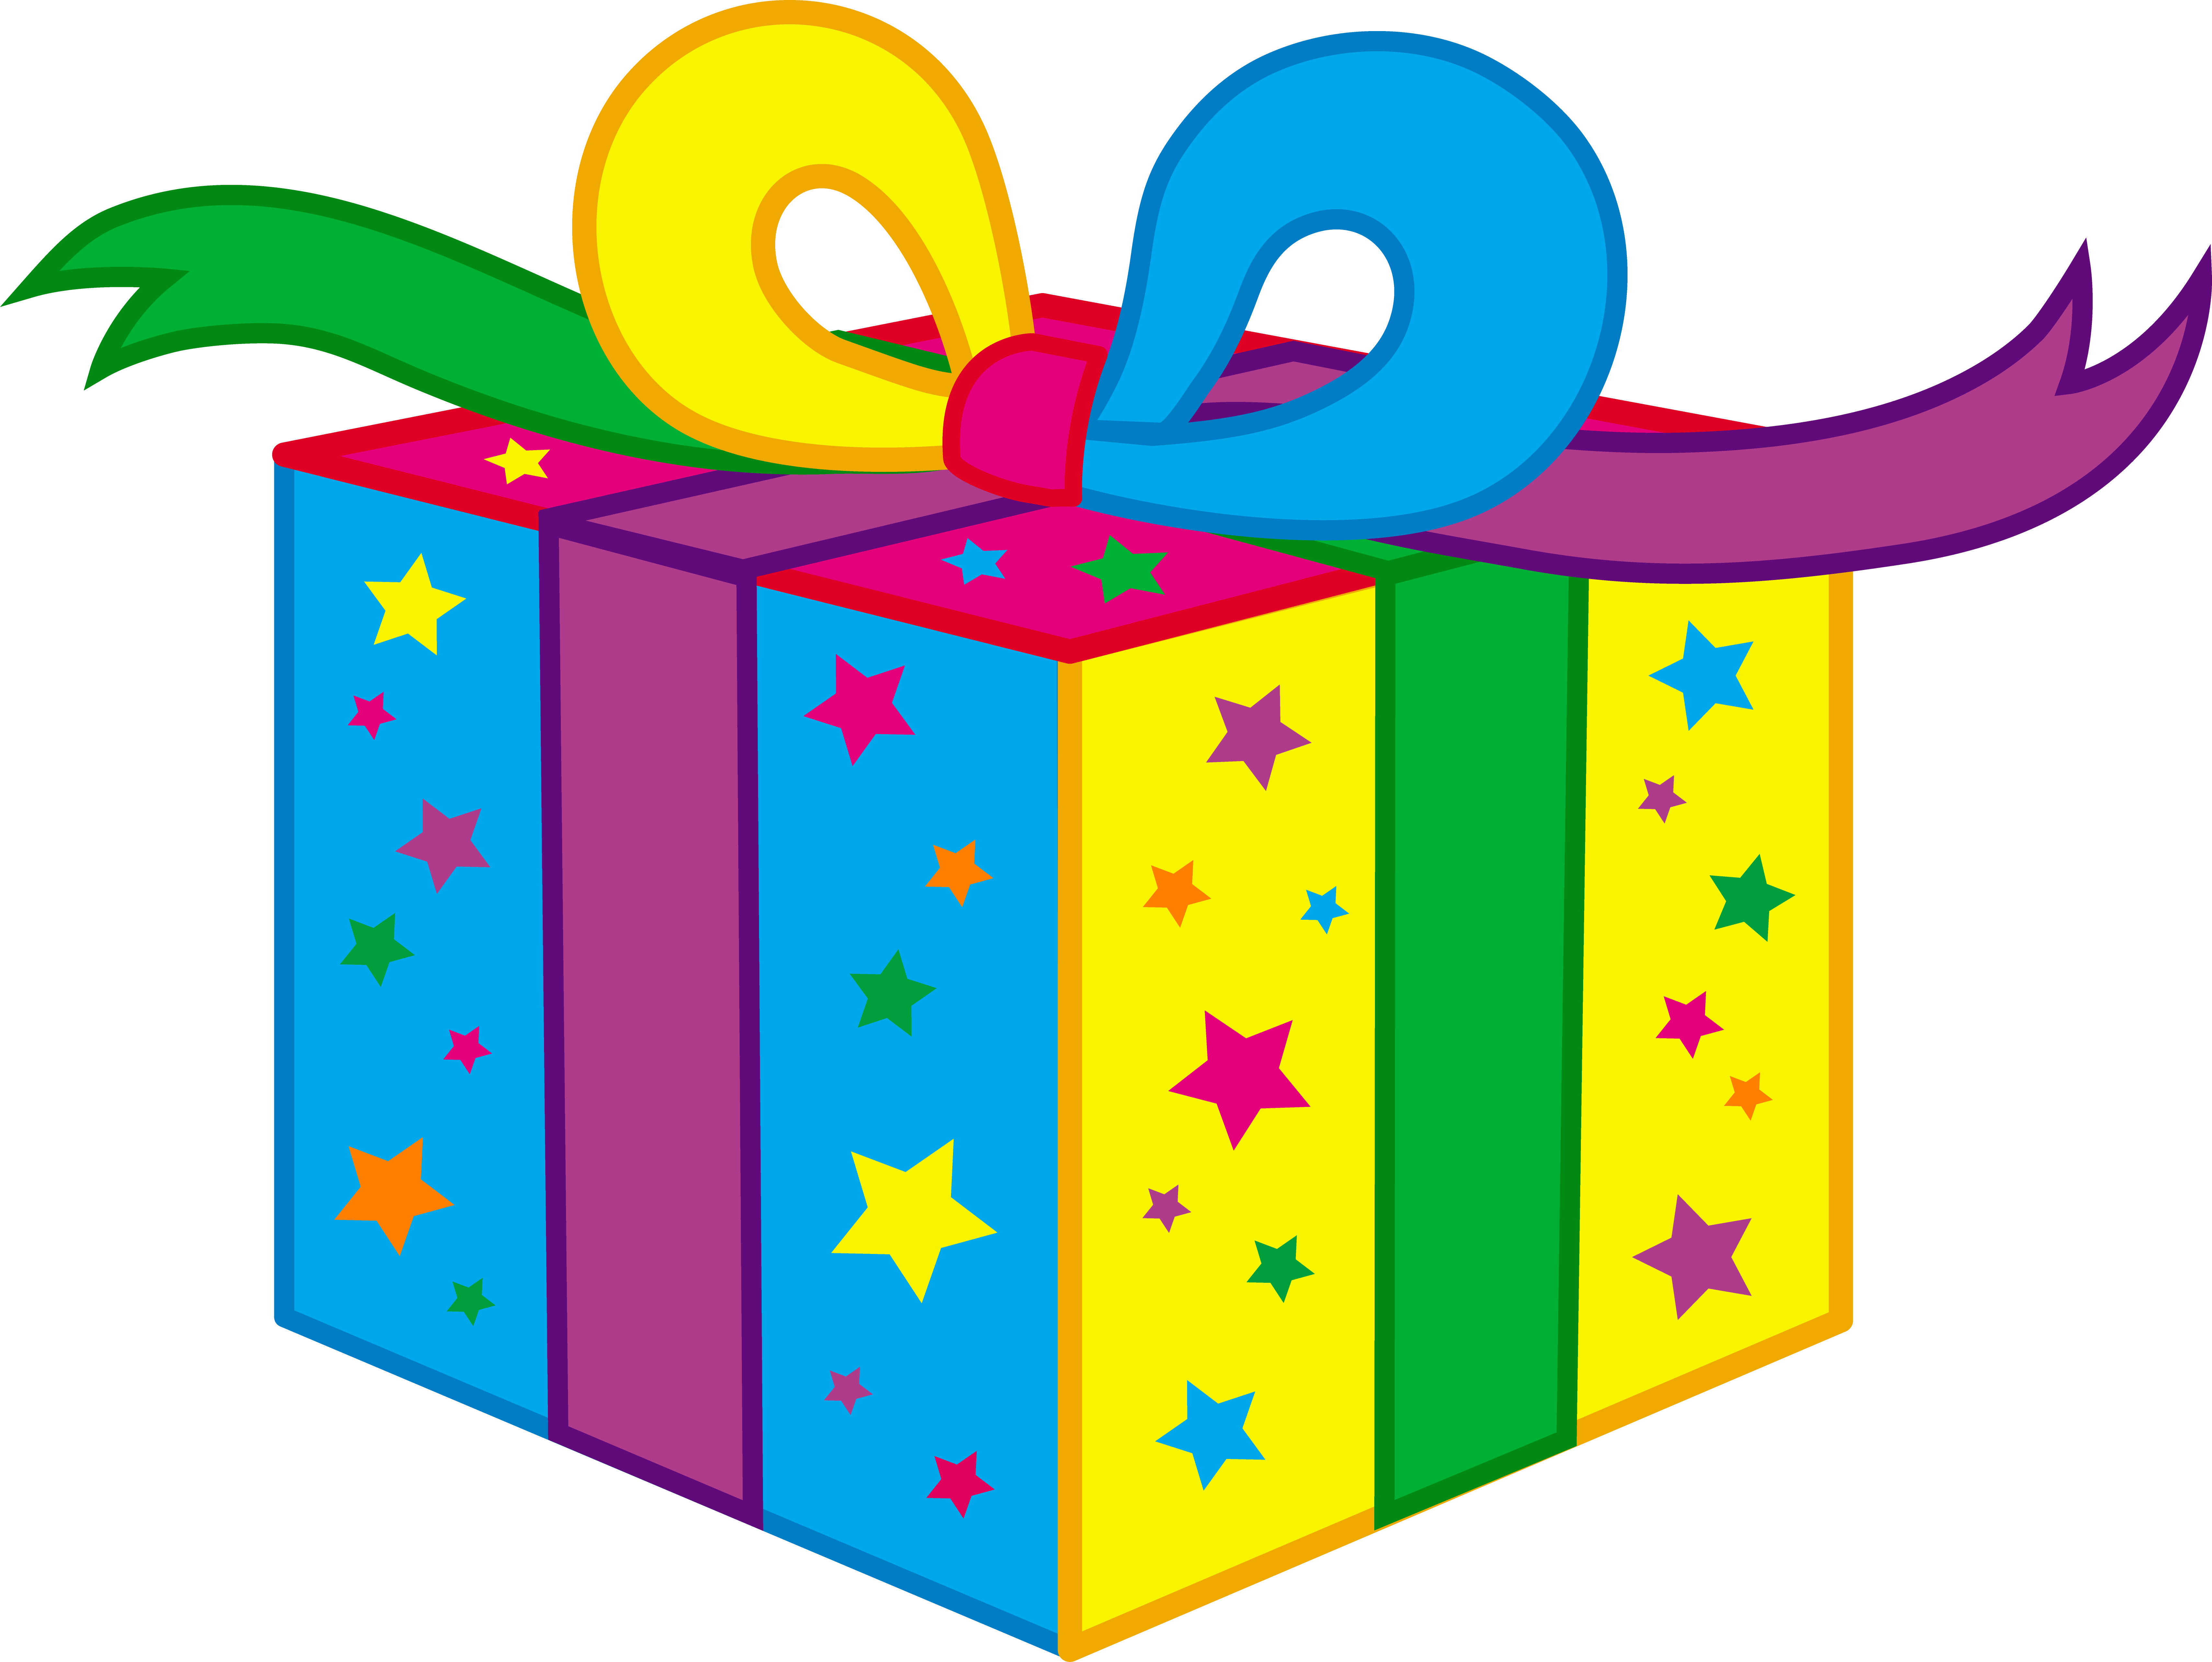 6831x5132 Kids Birthday Party Present